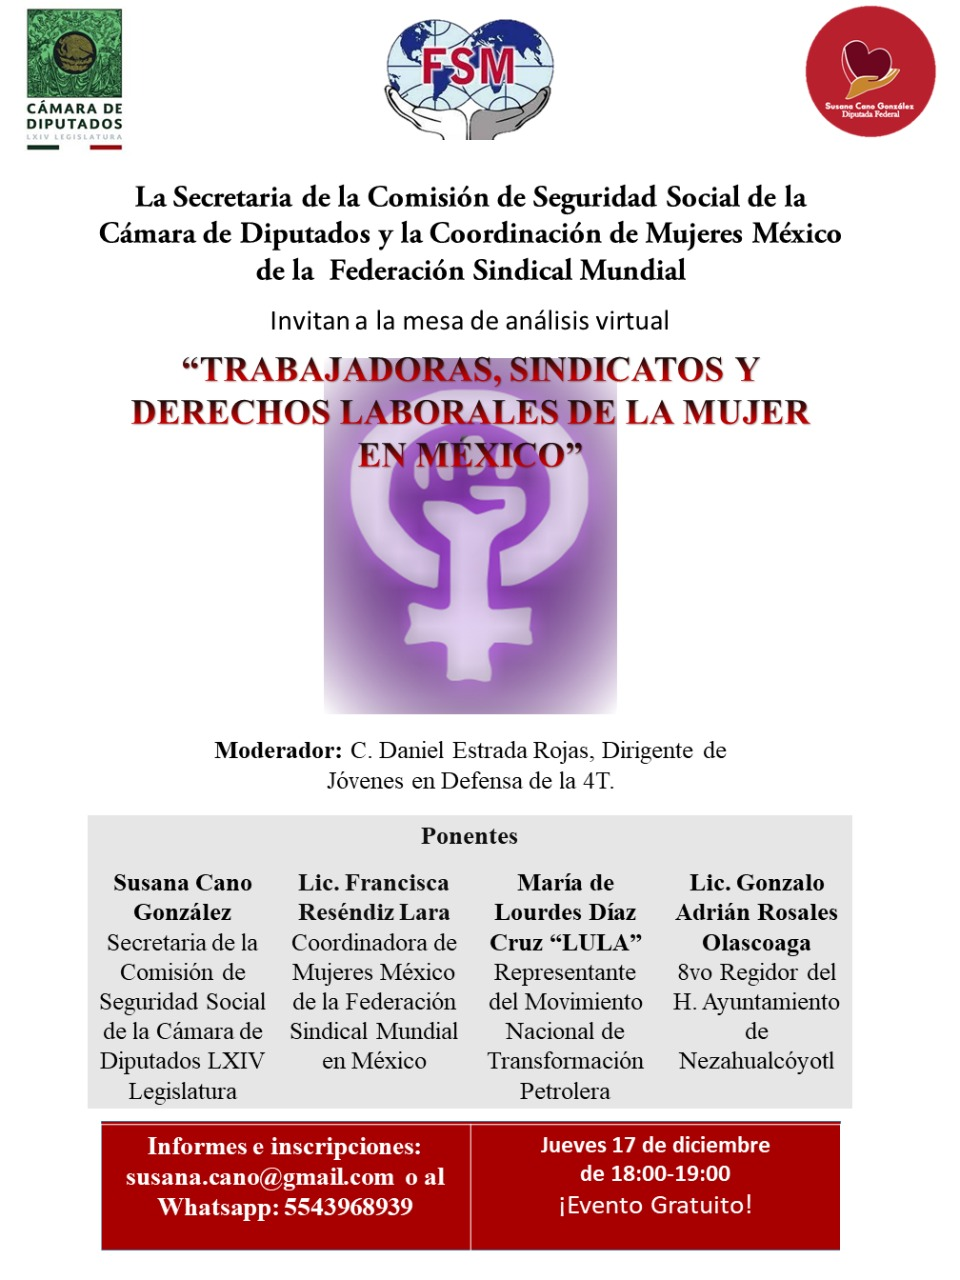 Francisca Reséndiz Lara participará en evento laboral nacional